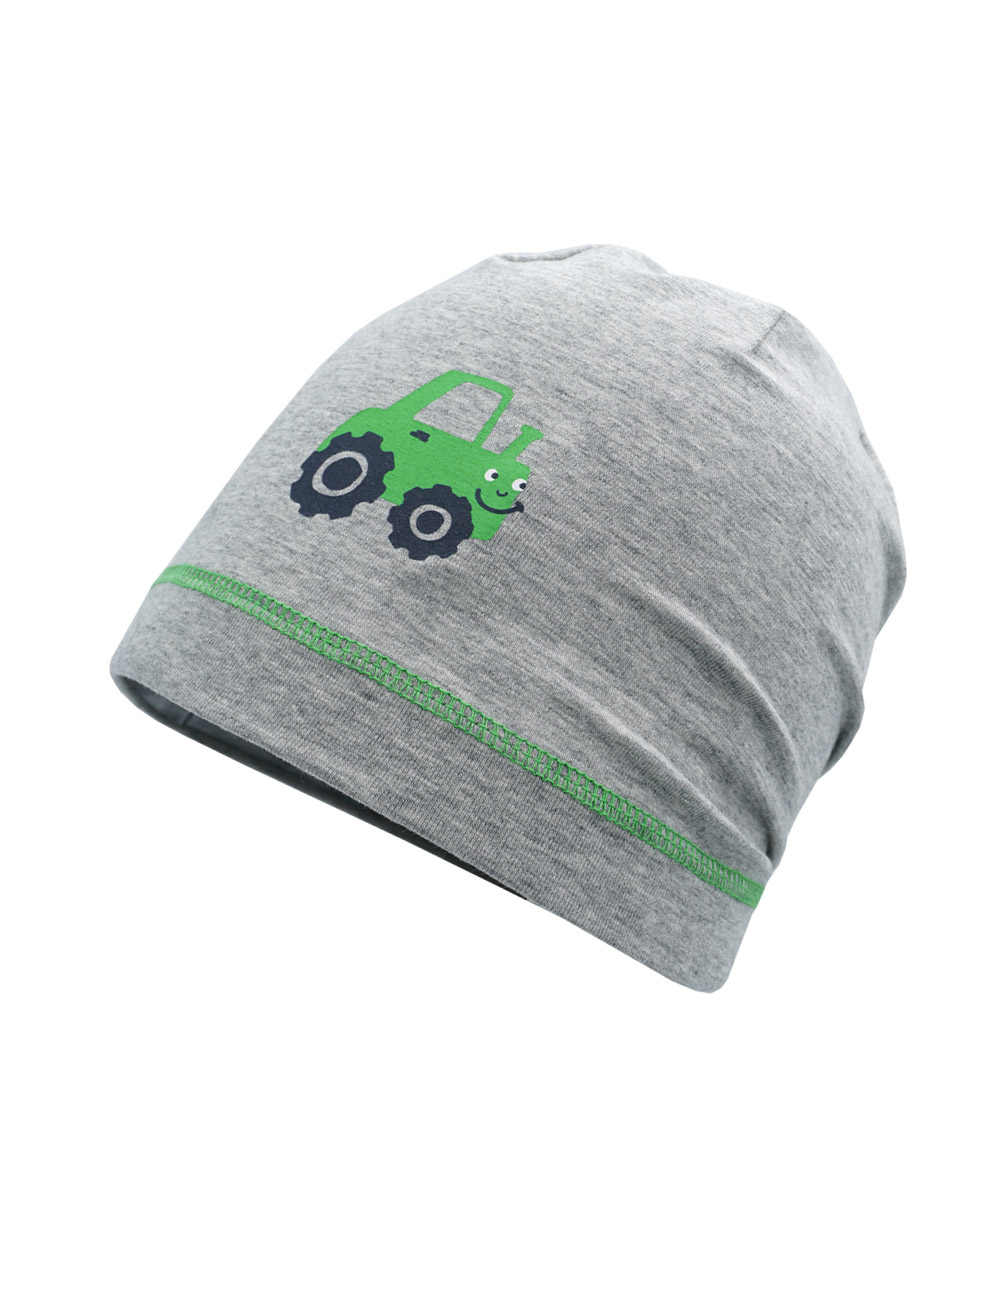 BOY-Beanie, tractor 51 Maximo. Farbe: graumeliert, Größe: 51/53